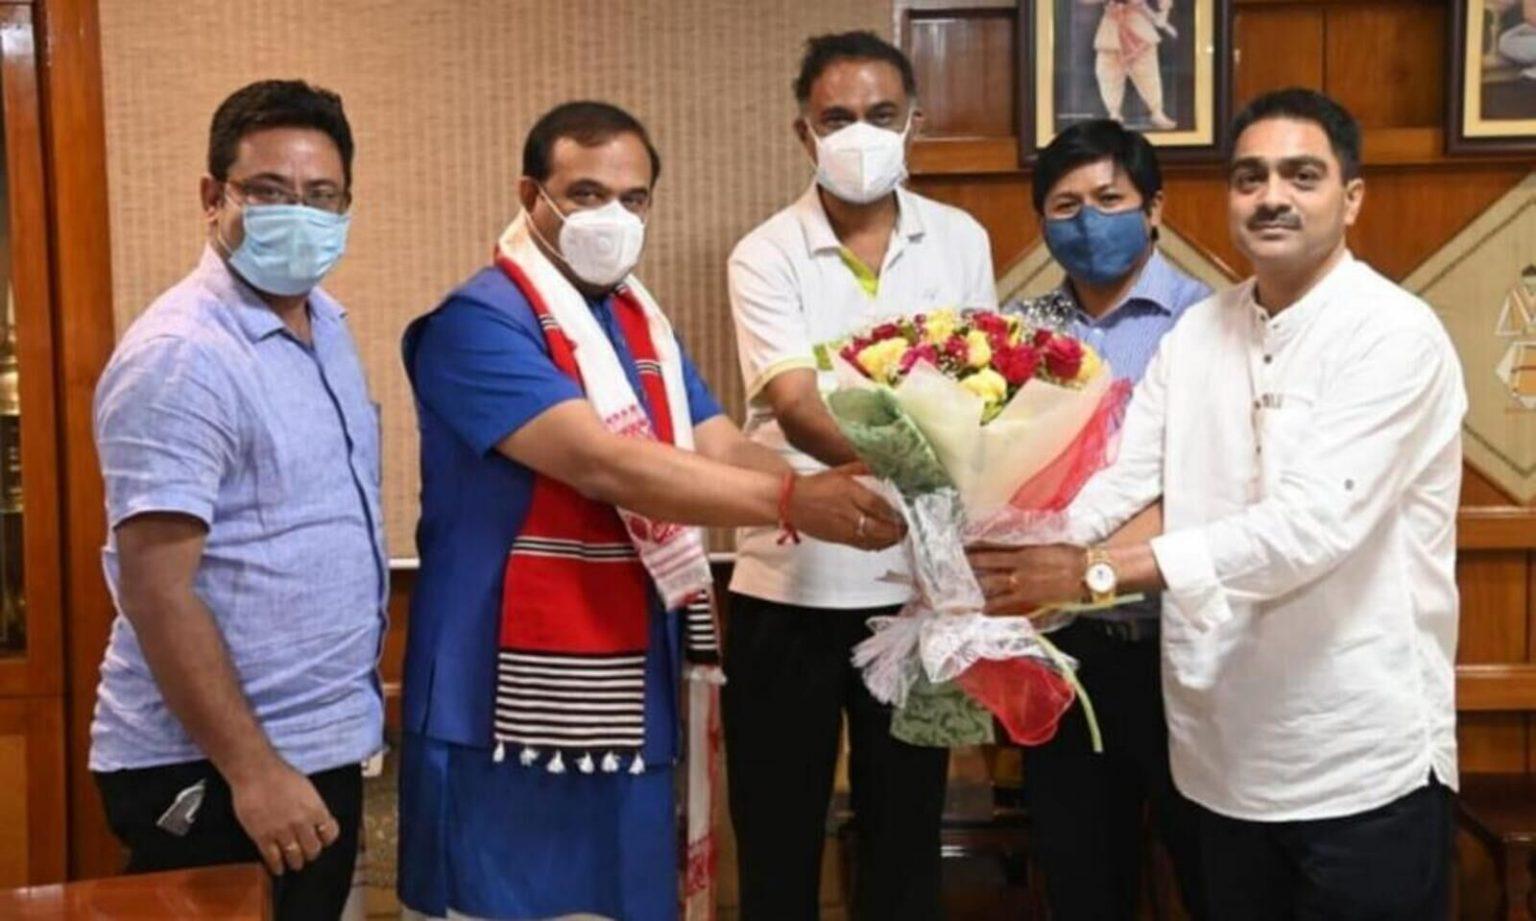 Himanta Biswa Sarma elected to BWF Council | BWF కౌన్సిల్ కు ఎన్నికైన హిమంత బిస్వా శర్మ |_40.1